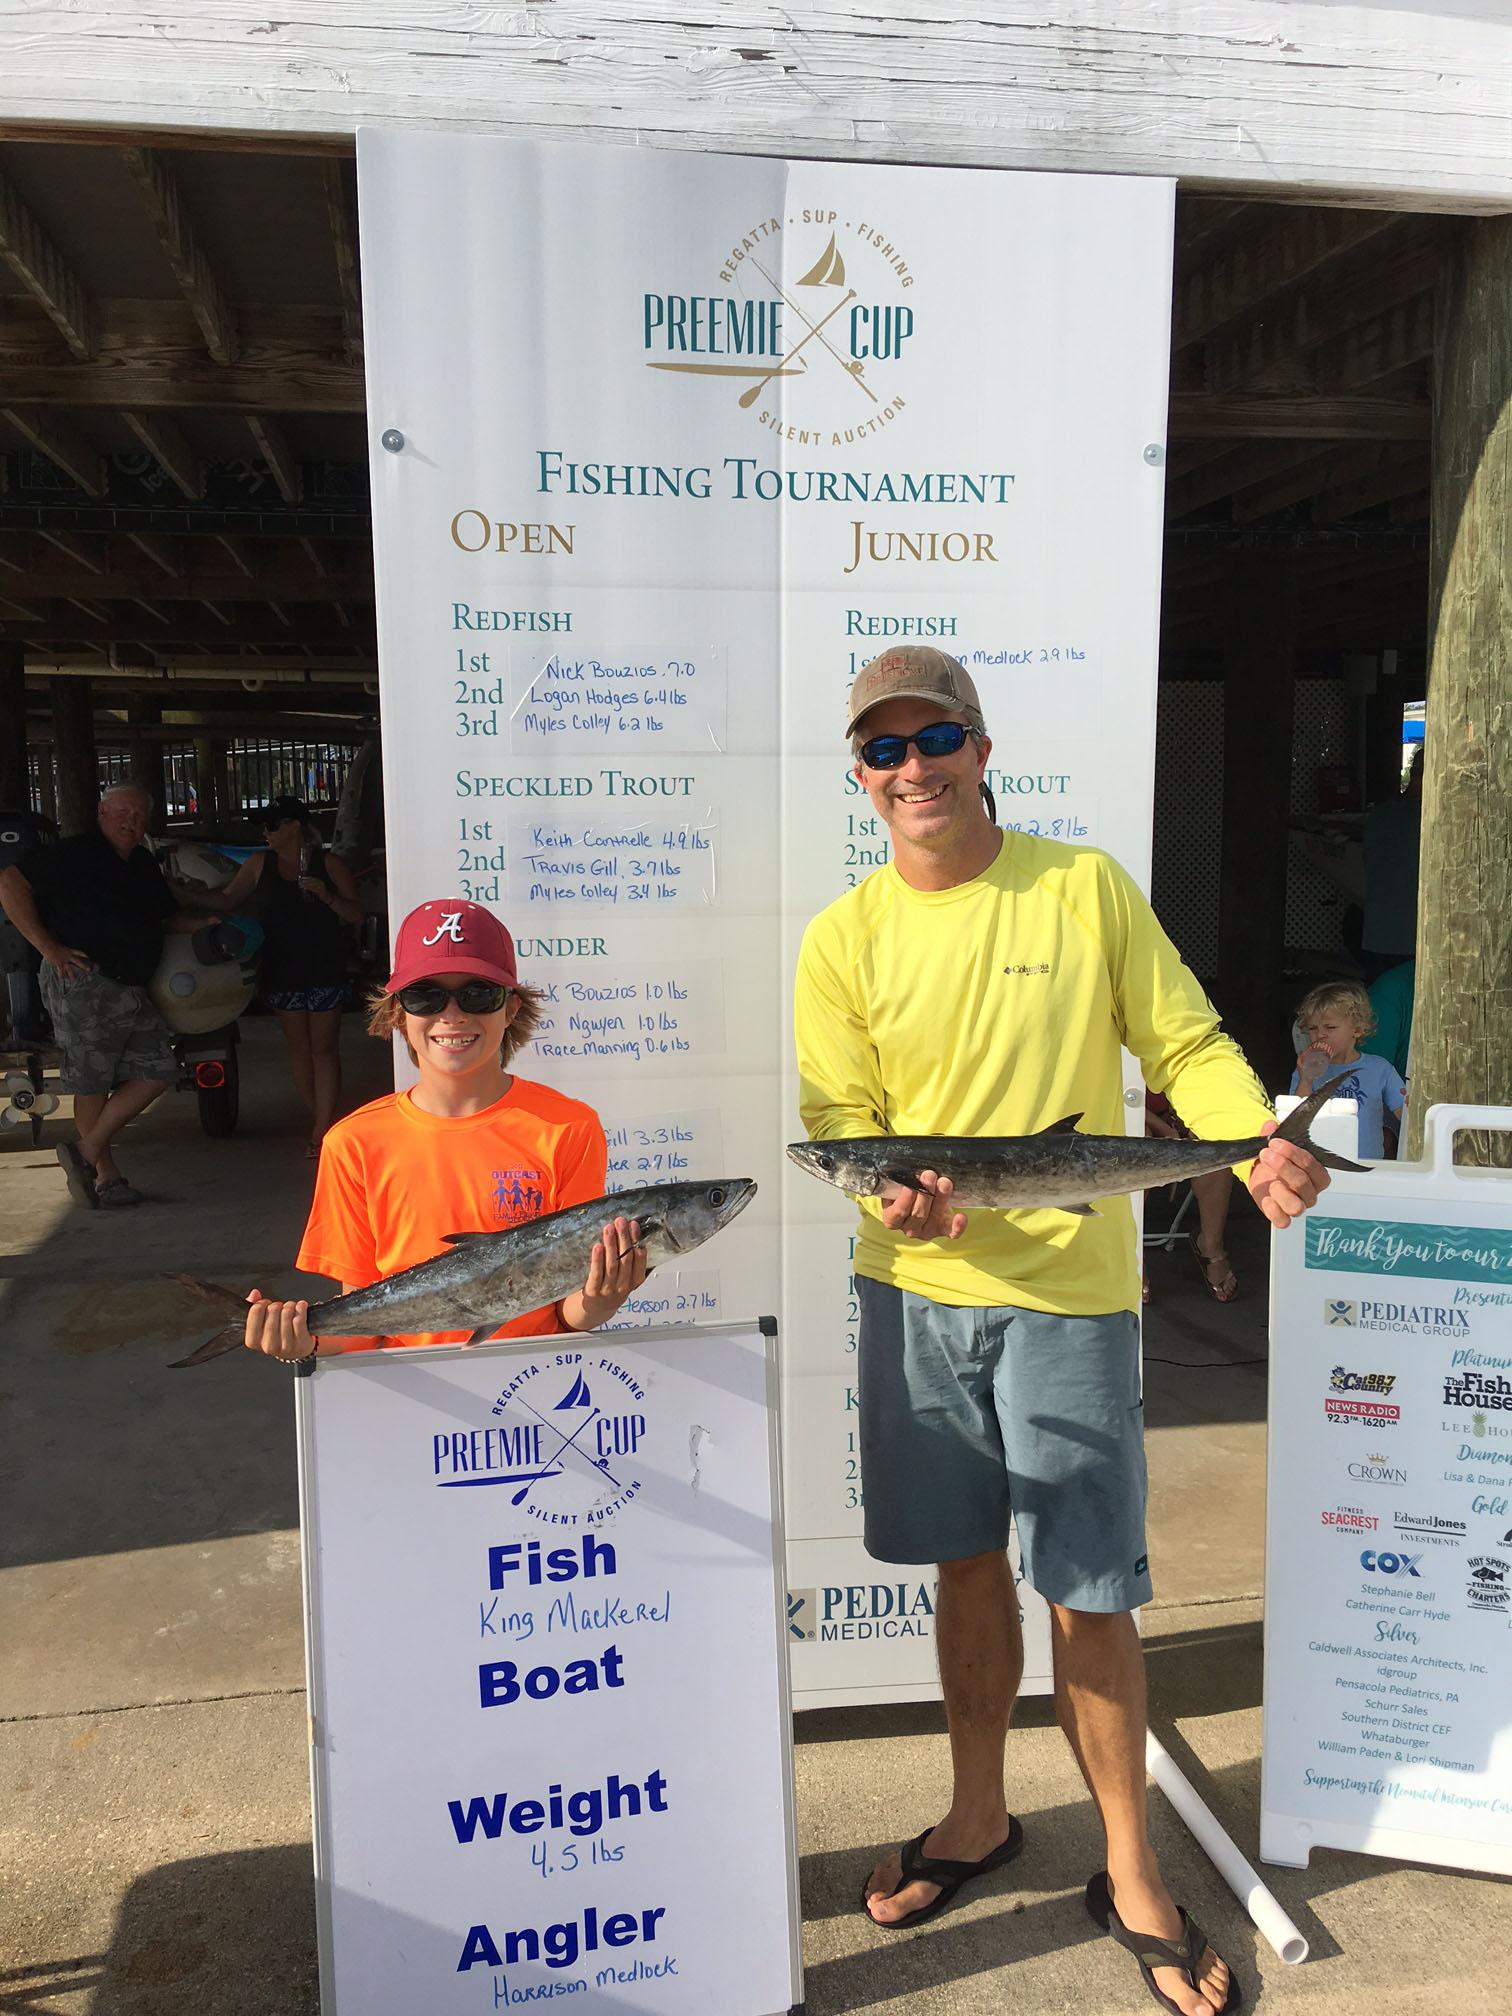 Pensacola Fishing Report 9/14/17